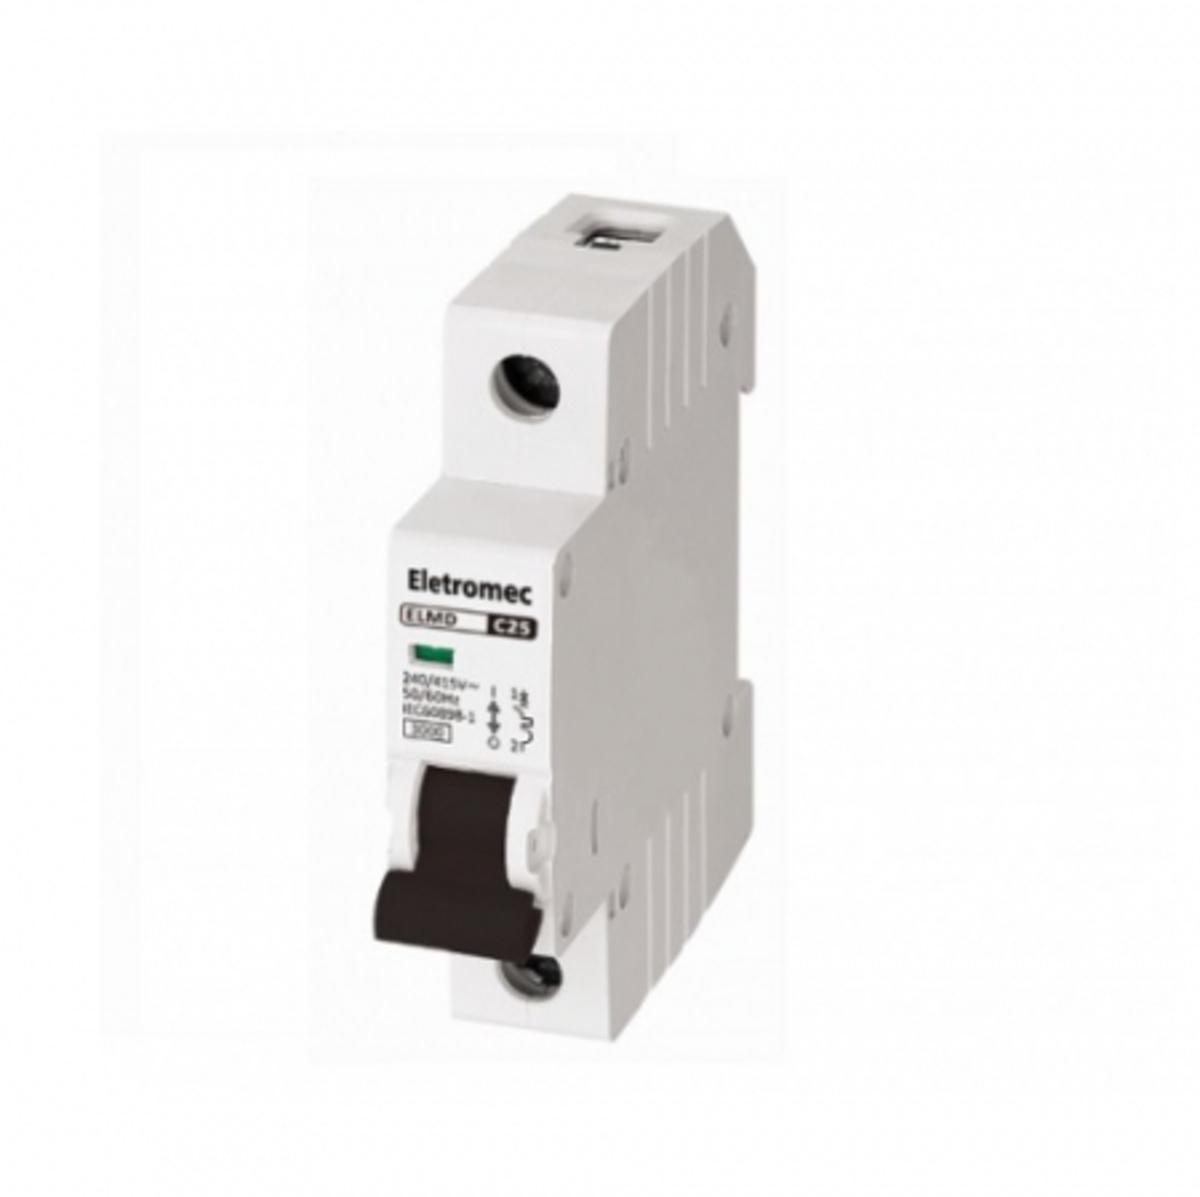 Eletriza - Eletriza Materiais Elétricos, Hidráulicos e Automação Industrial - MINI DISJUNTOR 1P 04A 3KA CURVA C ELMD1C4 ELETROMEC